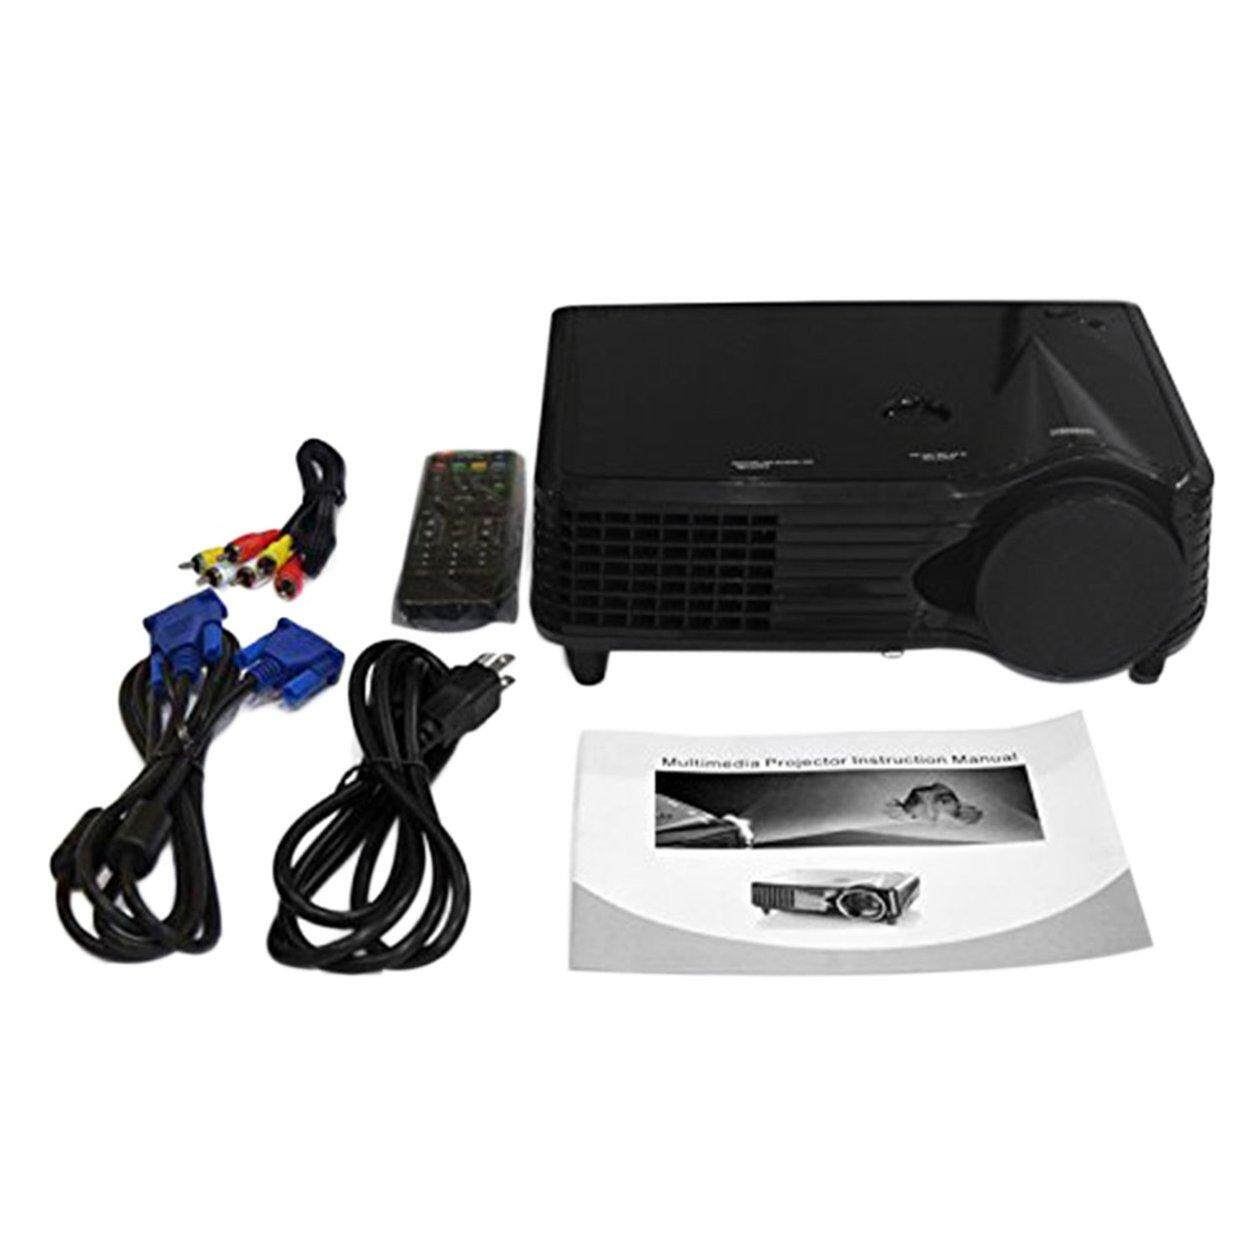 Top Deals Portable LCD LED Projector 800*480 2000 Lumen HD Home Theater HDMI VGA AV USB